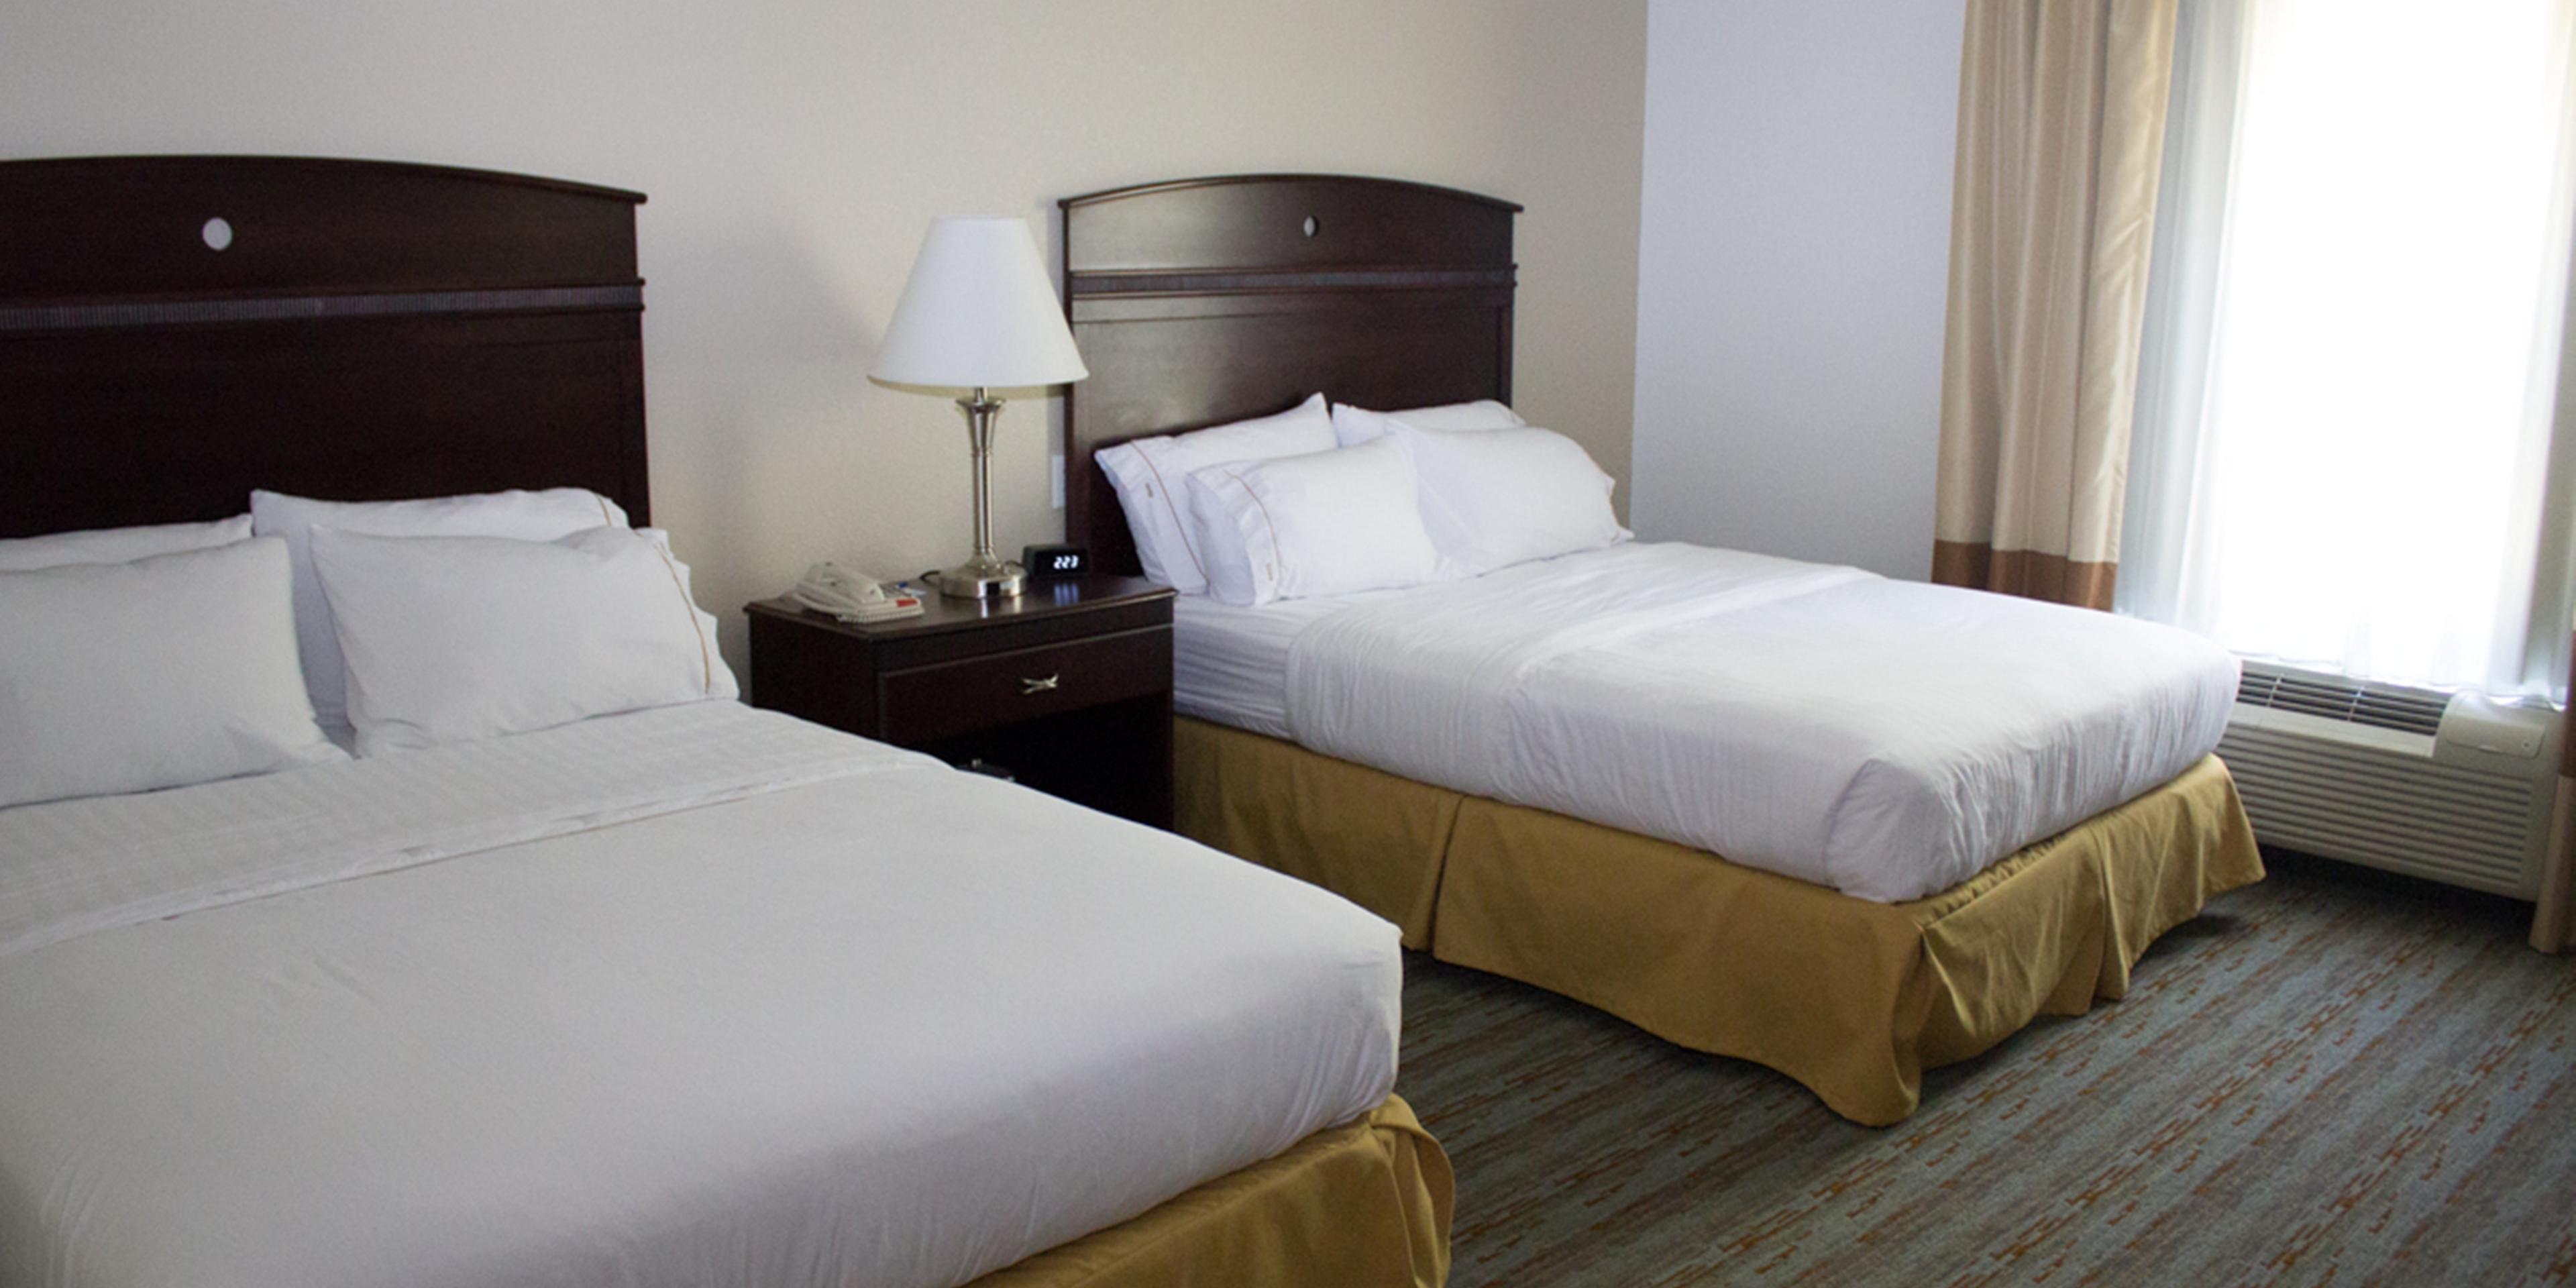 Holiday Inn Express West Jefferson Hotel by IHG